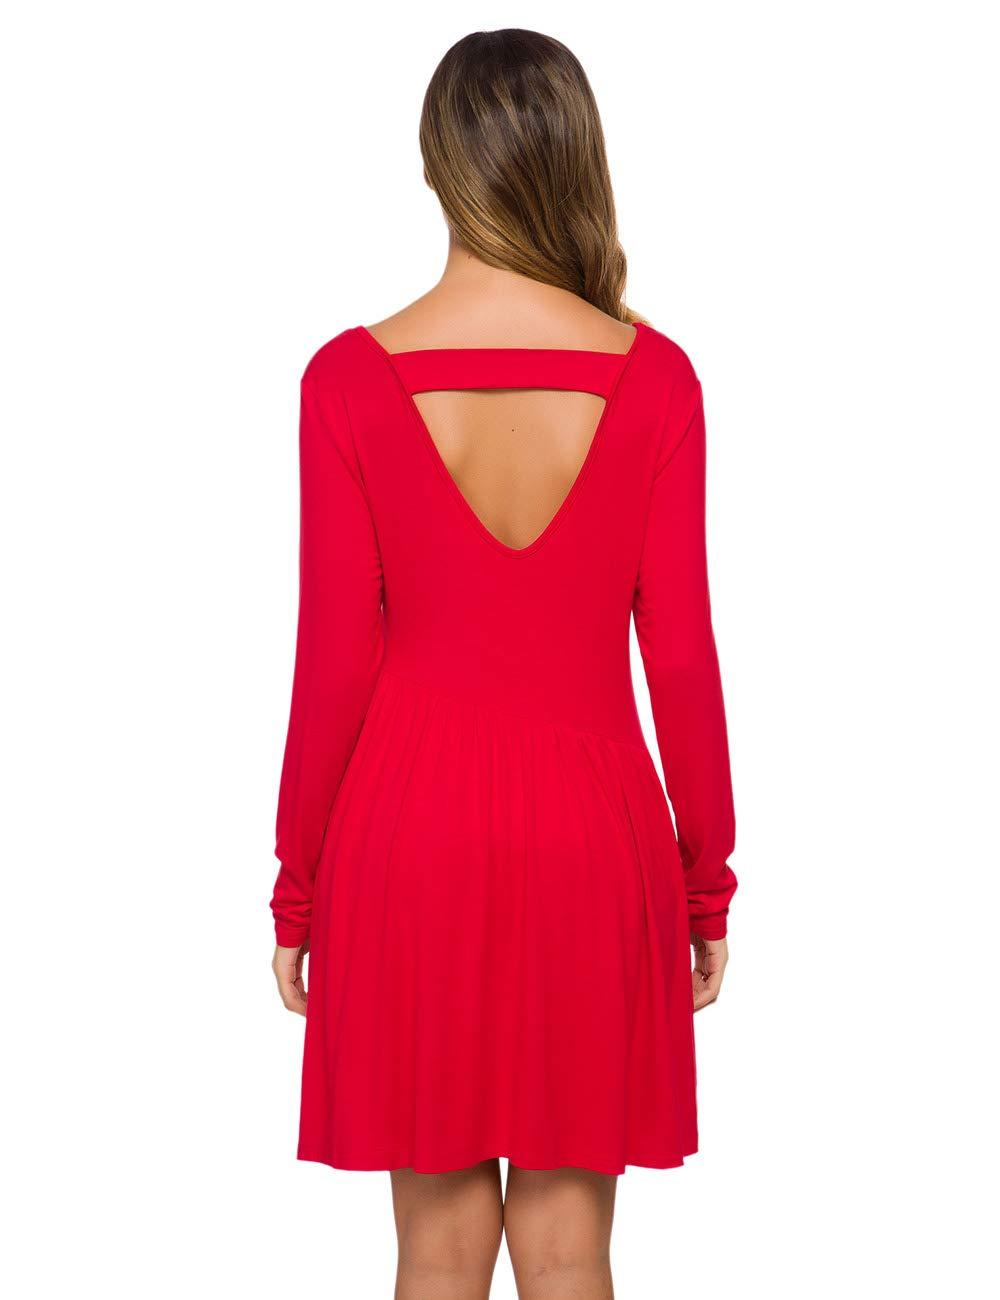 Long Sleeve Short Dresses Casual Loose Dress Back V Neck Tunic Dress